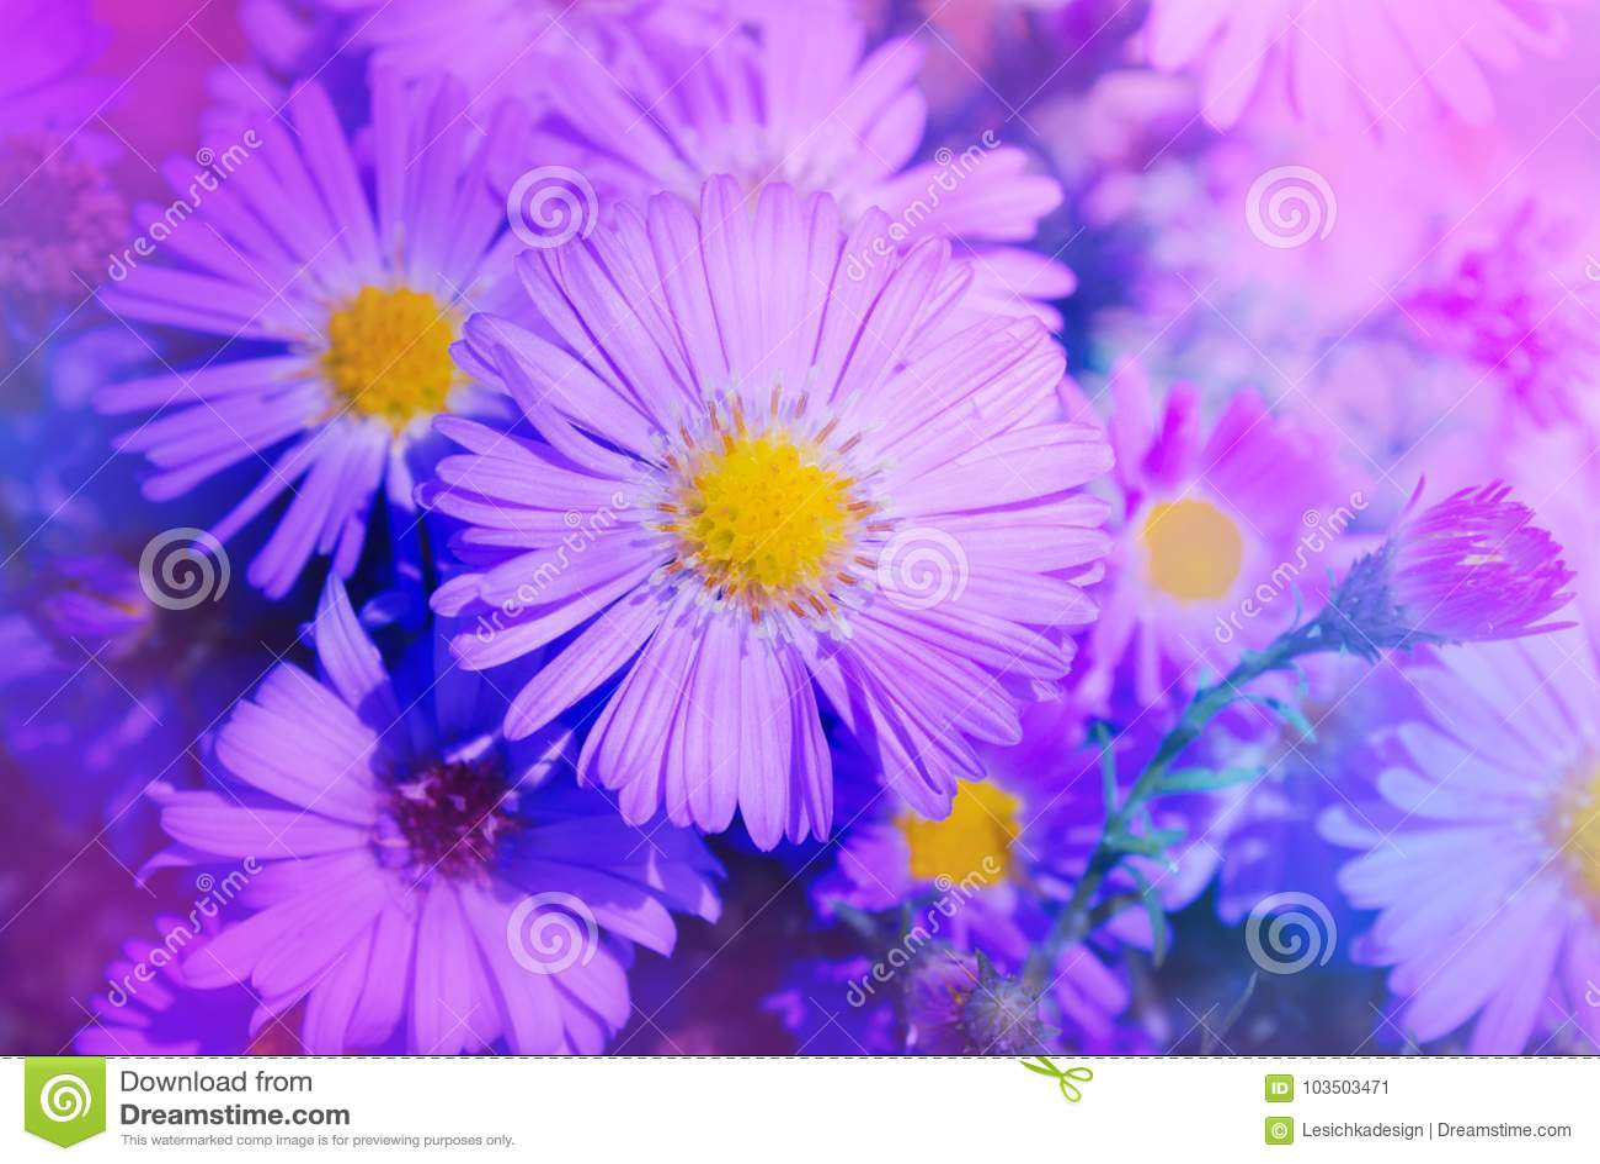 Beautiful Pink Aster Flower Autumn Flowers In The Garden Stock